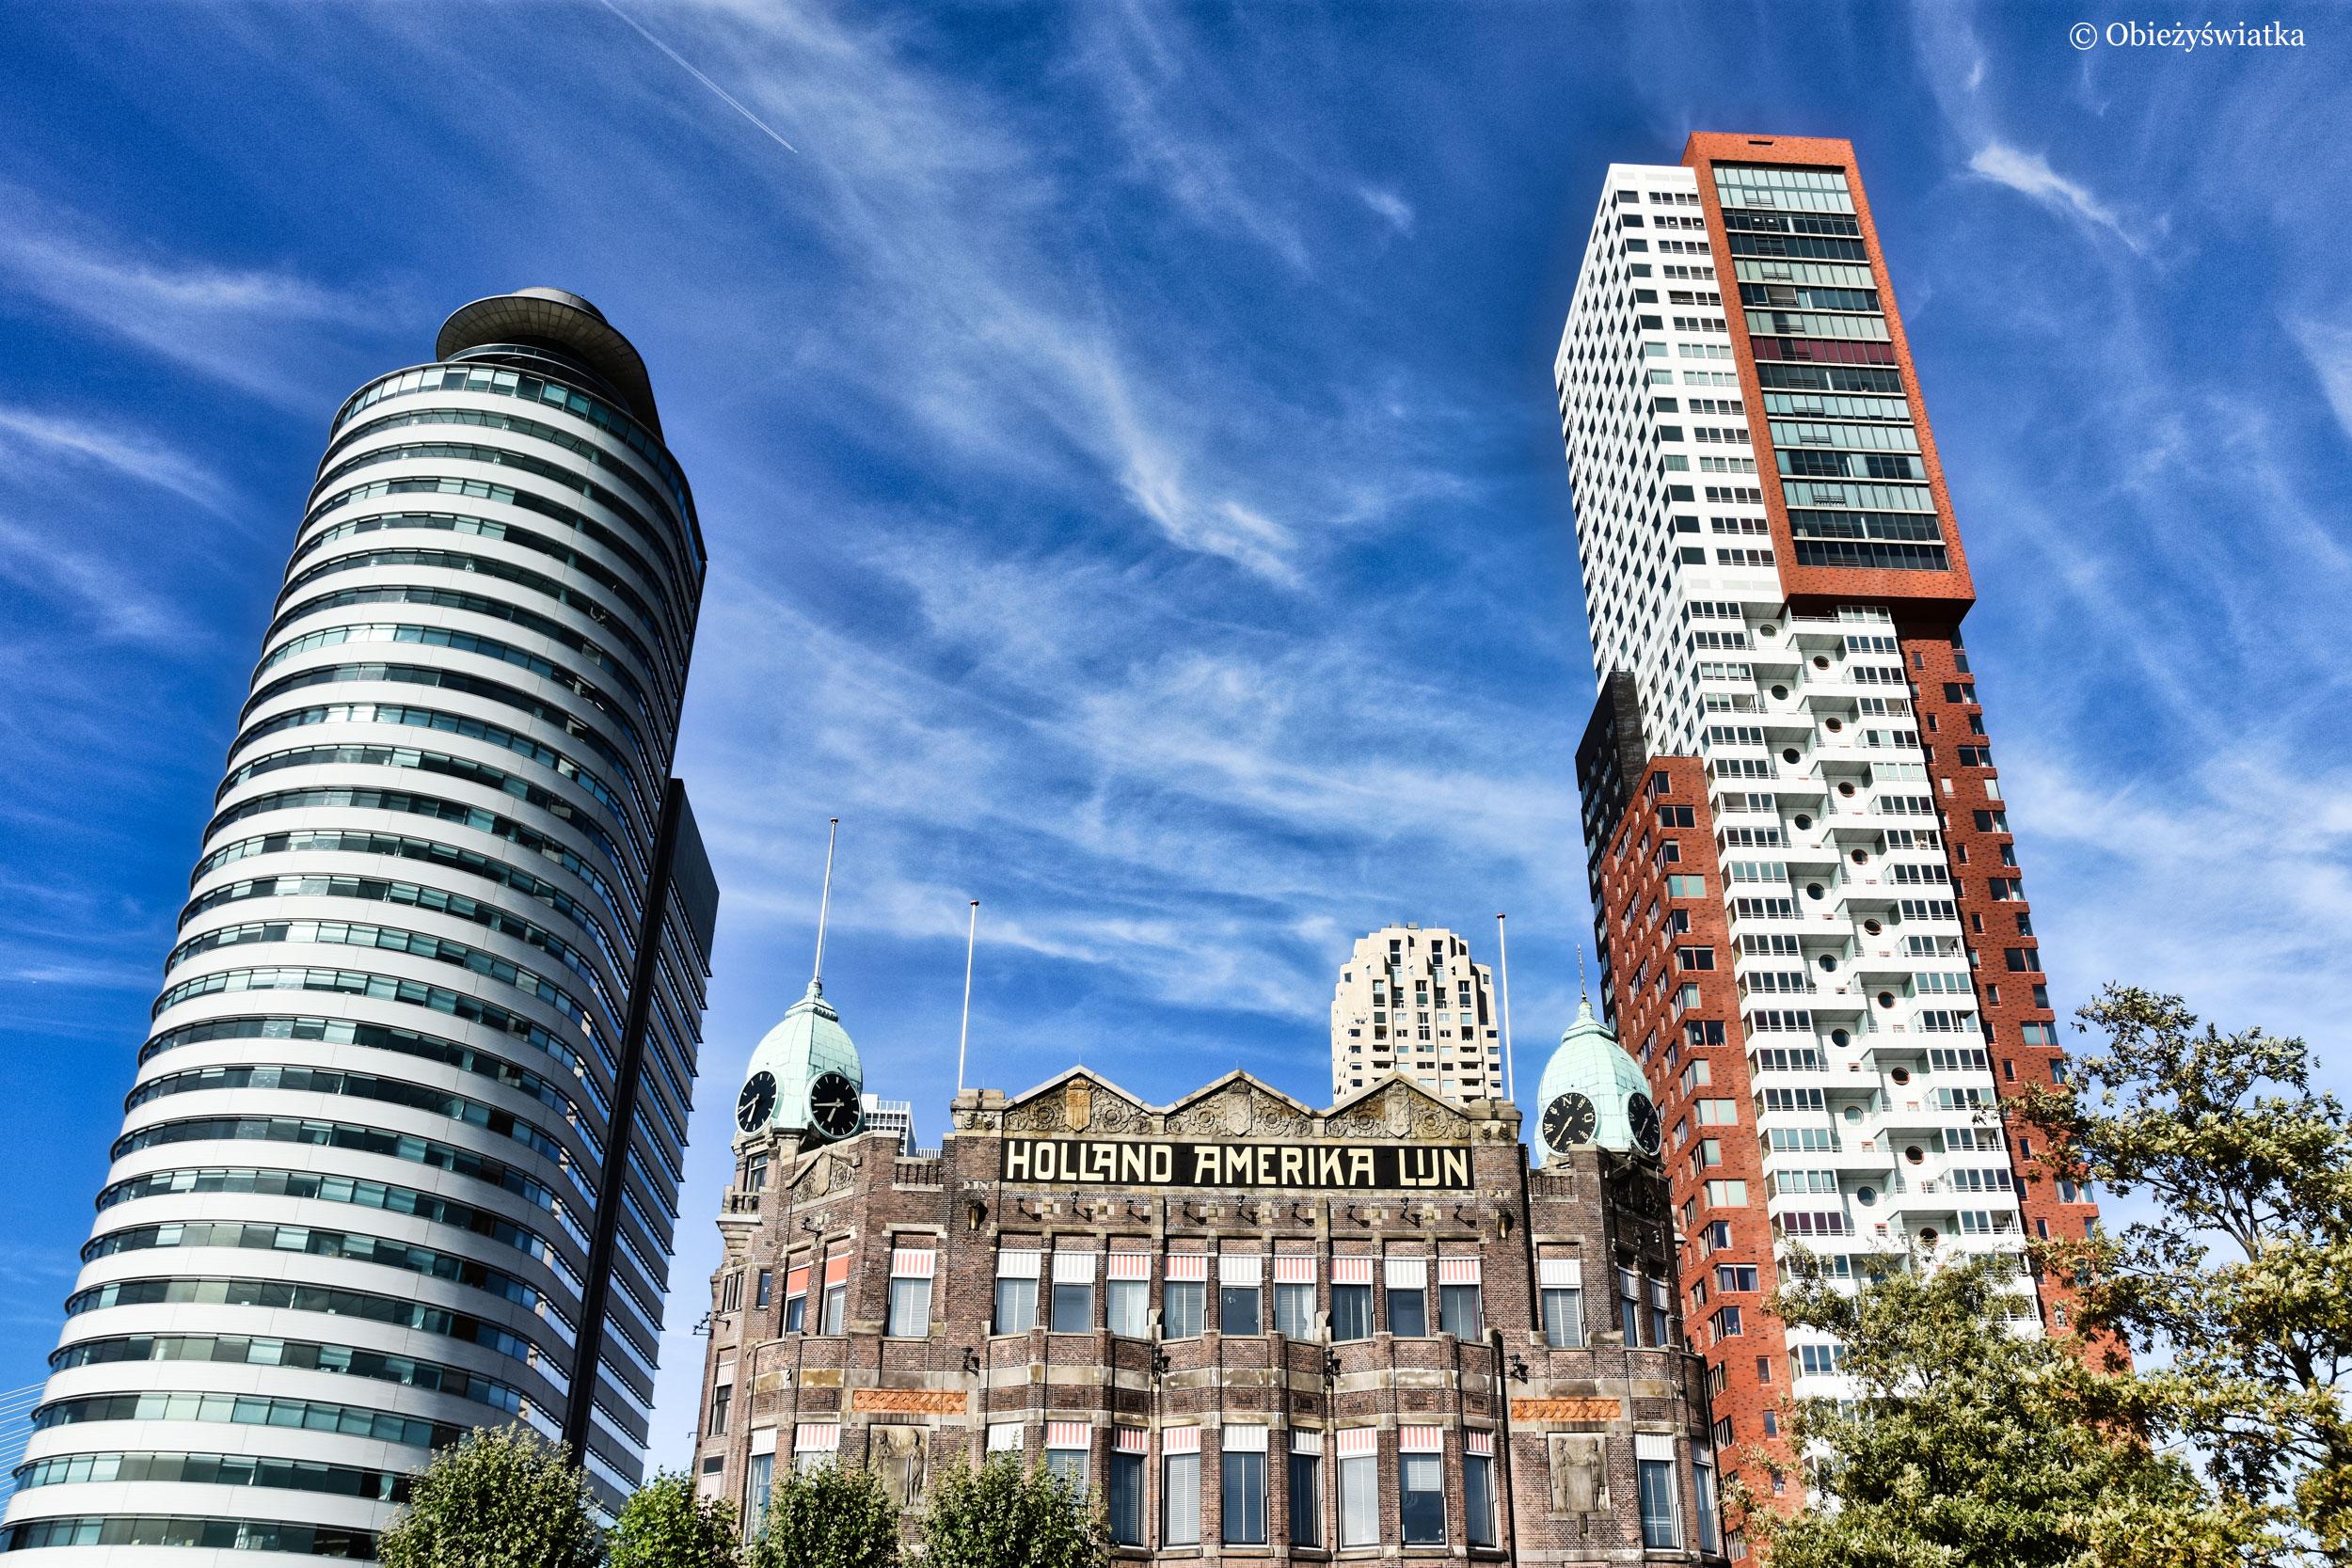 World Port Center, Holland Amerika Lijn i Montevideo Tower, Rotterdam